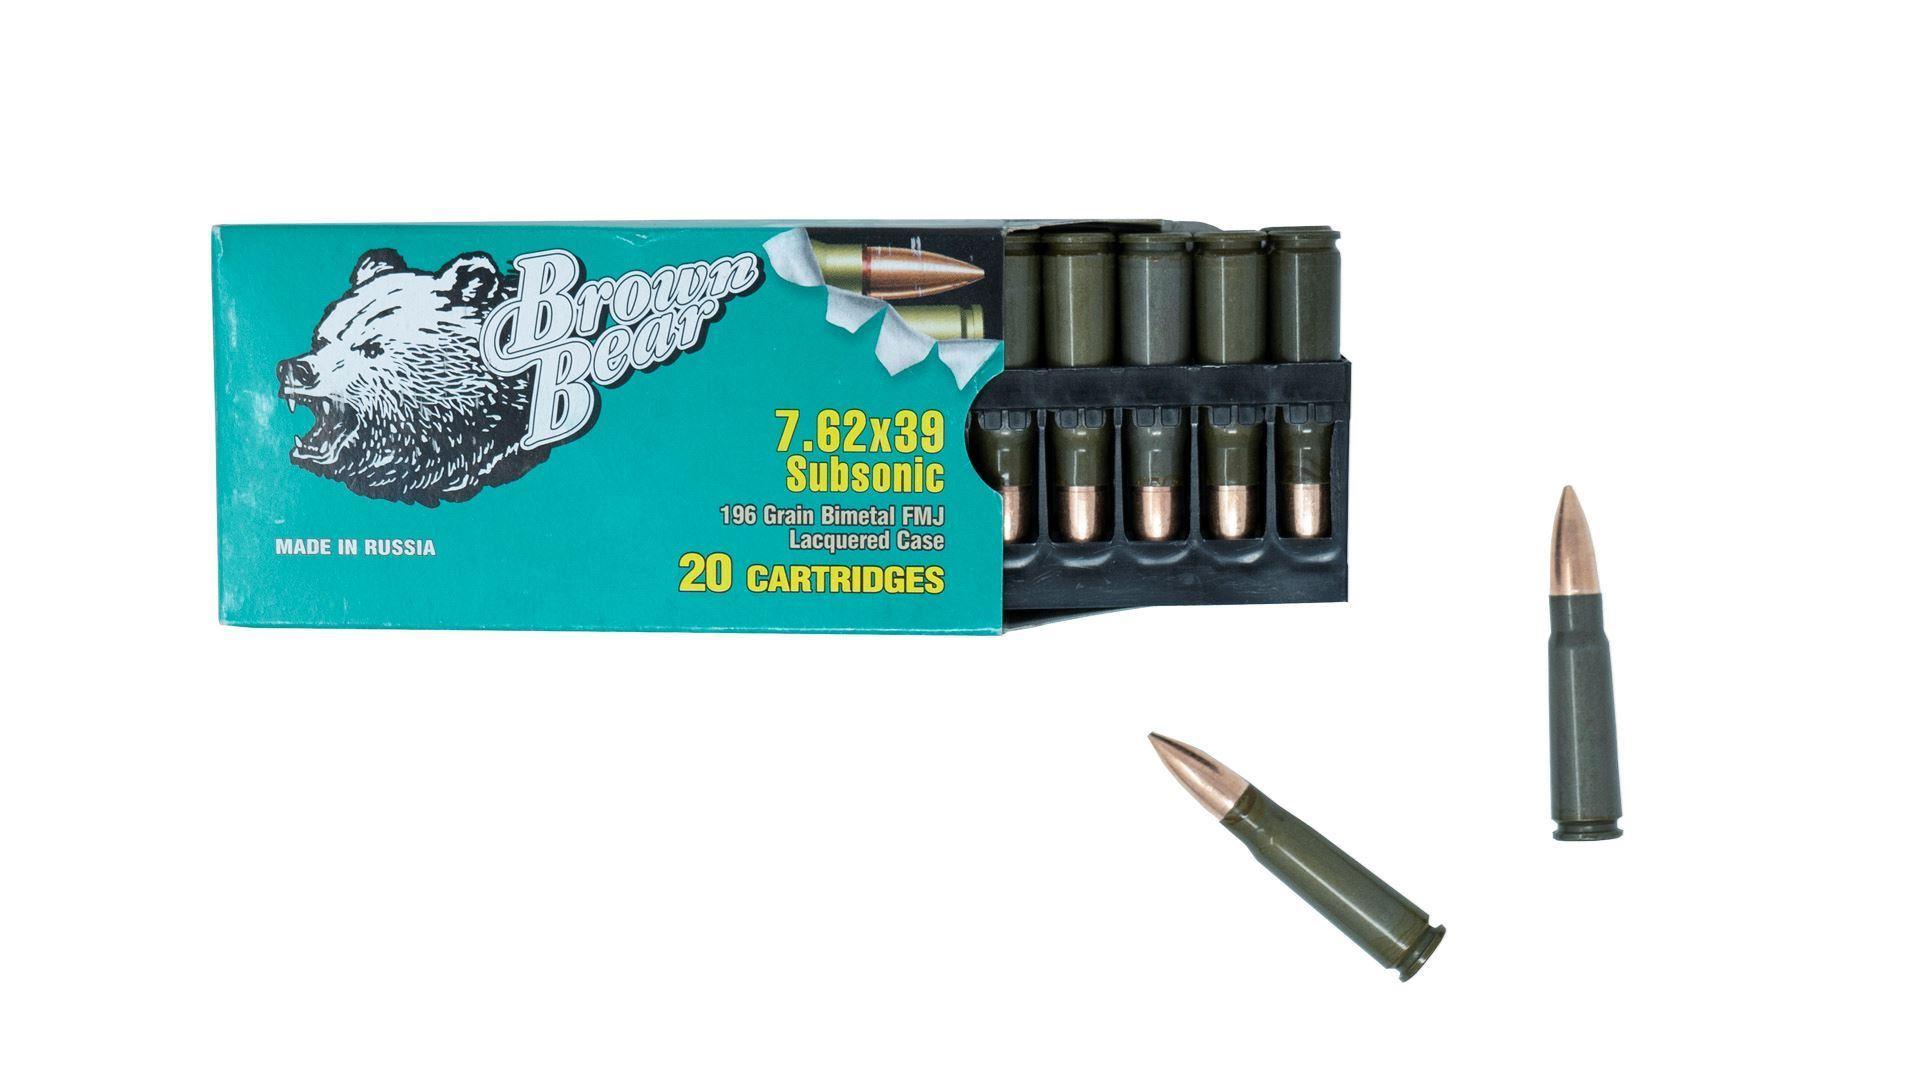 Subsonic Brown Bear 7 62x39 Ammunition Box 20 Rounds - $11 99